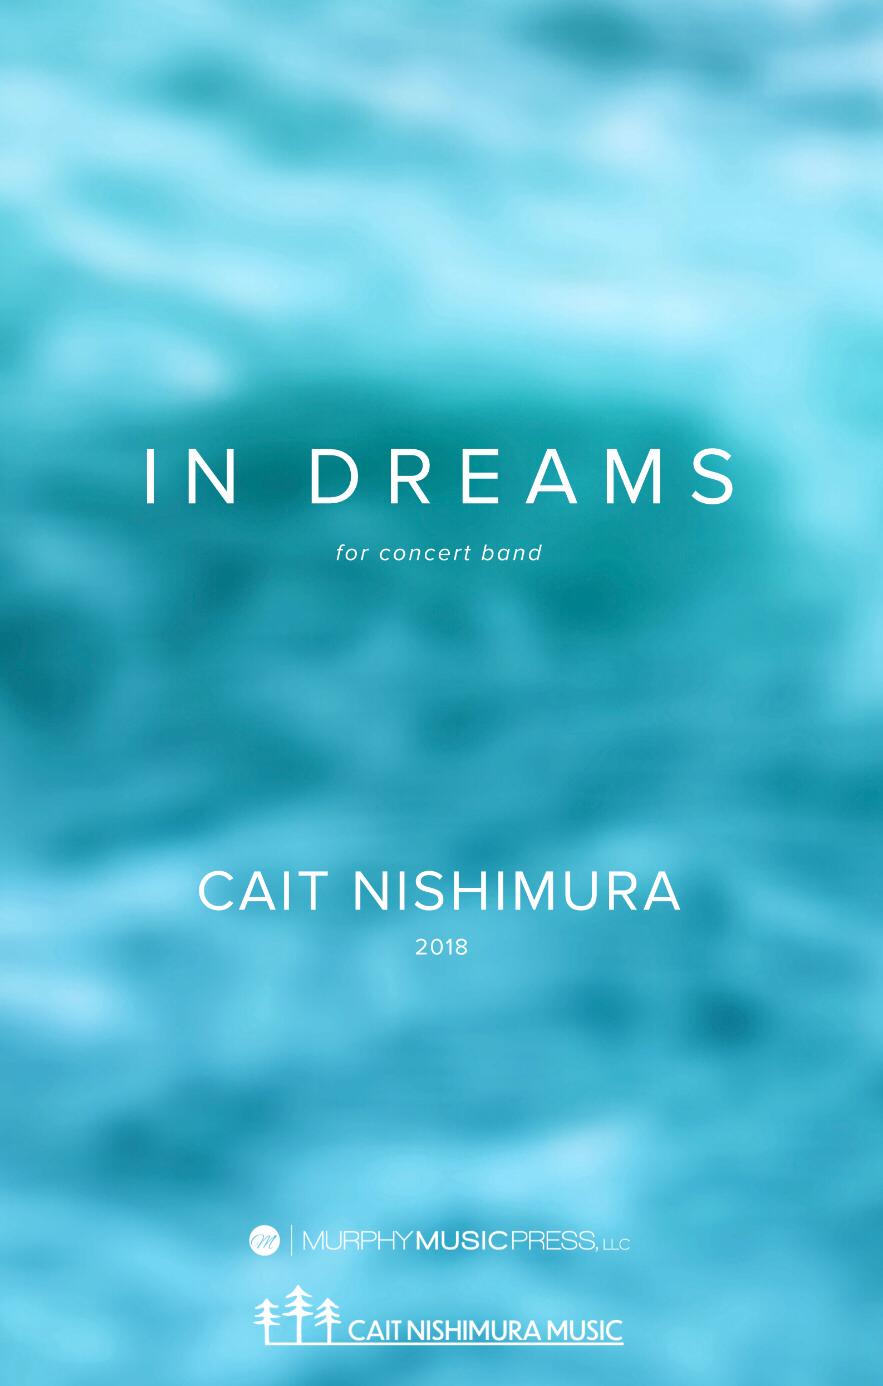 In Dreams by Cait Nishimura